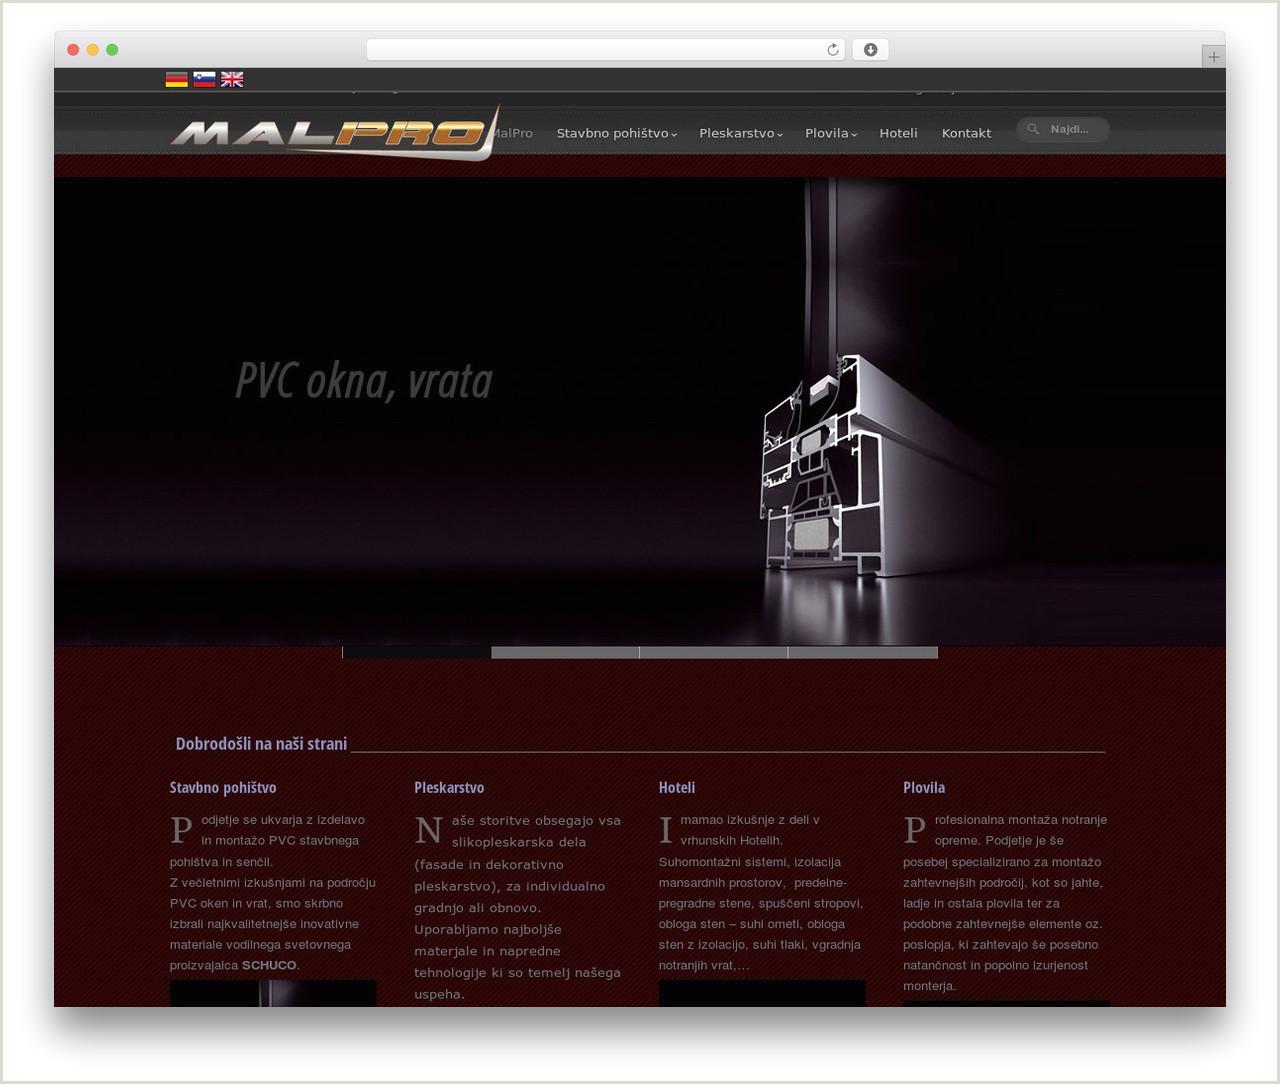 Meari WordPress website template by Hana malpro